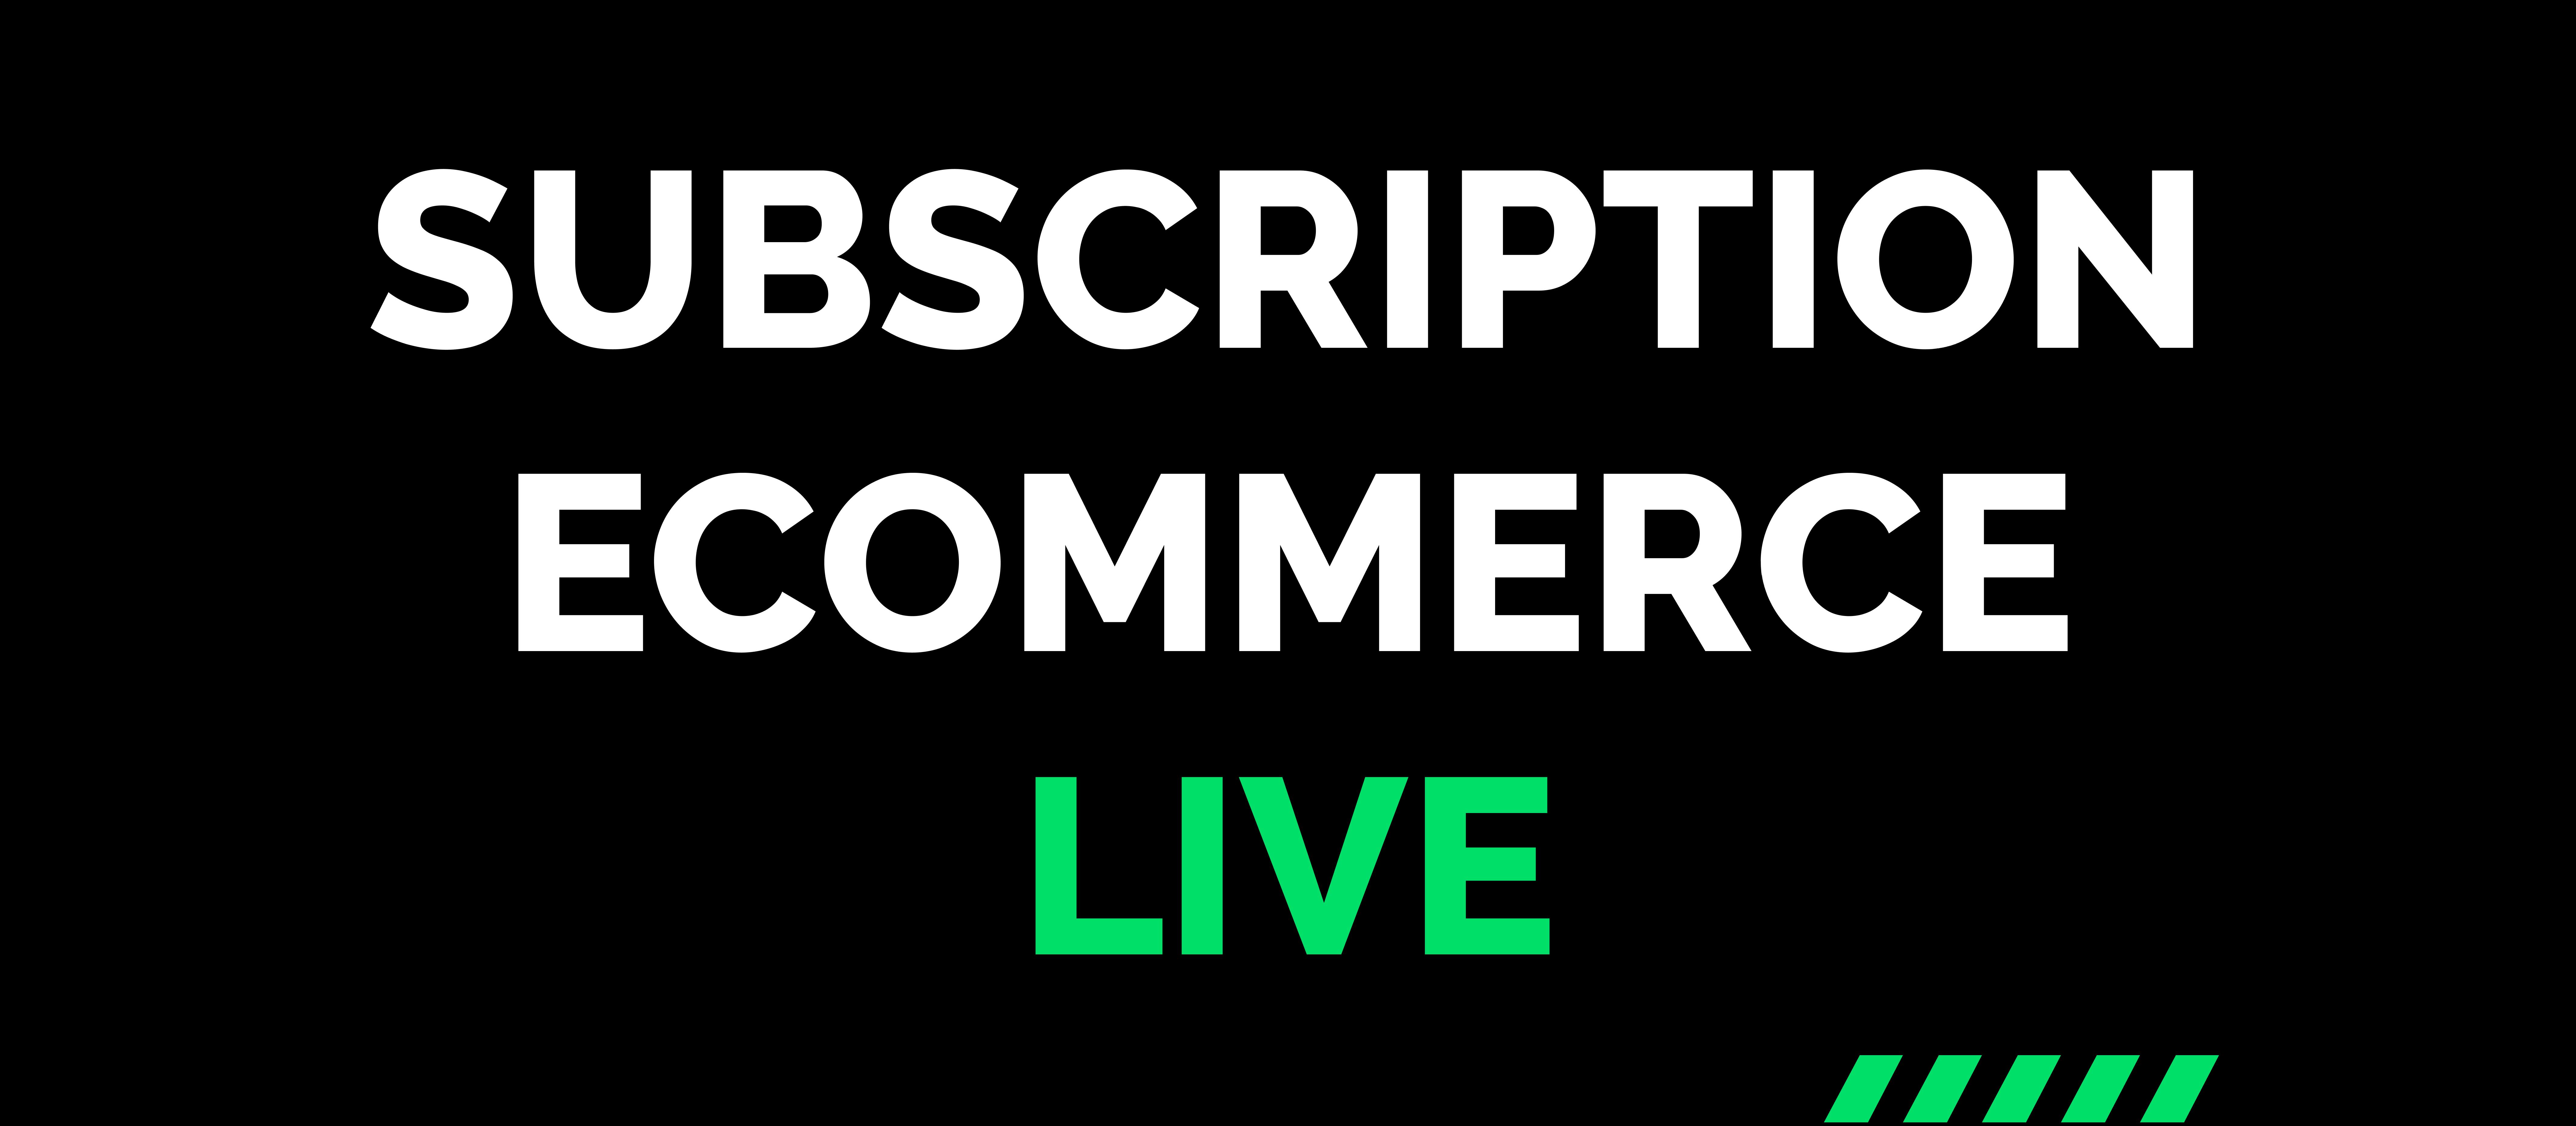 Subscription Ecommerce Live